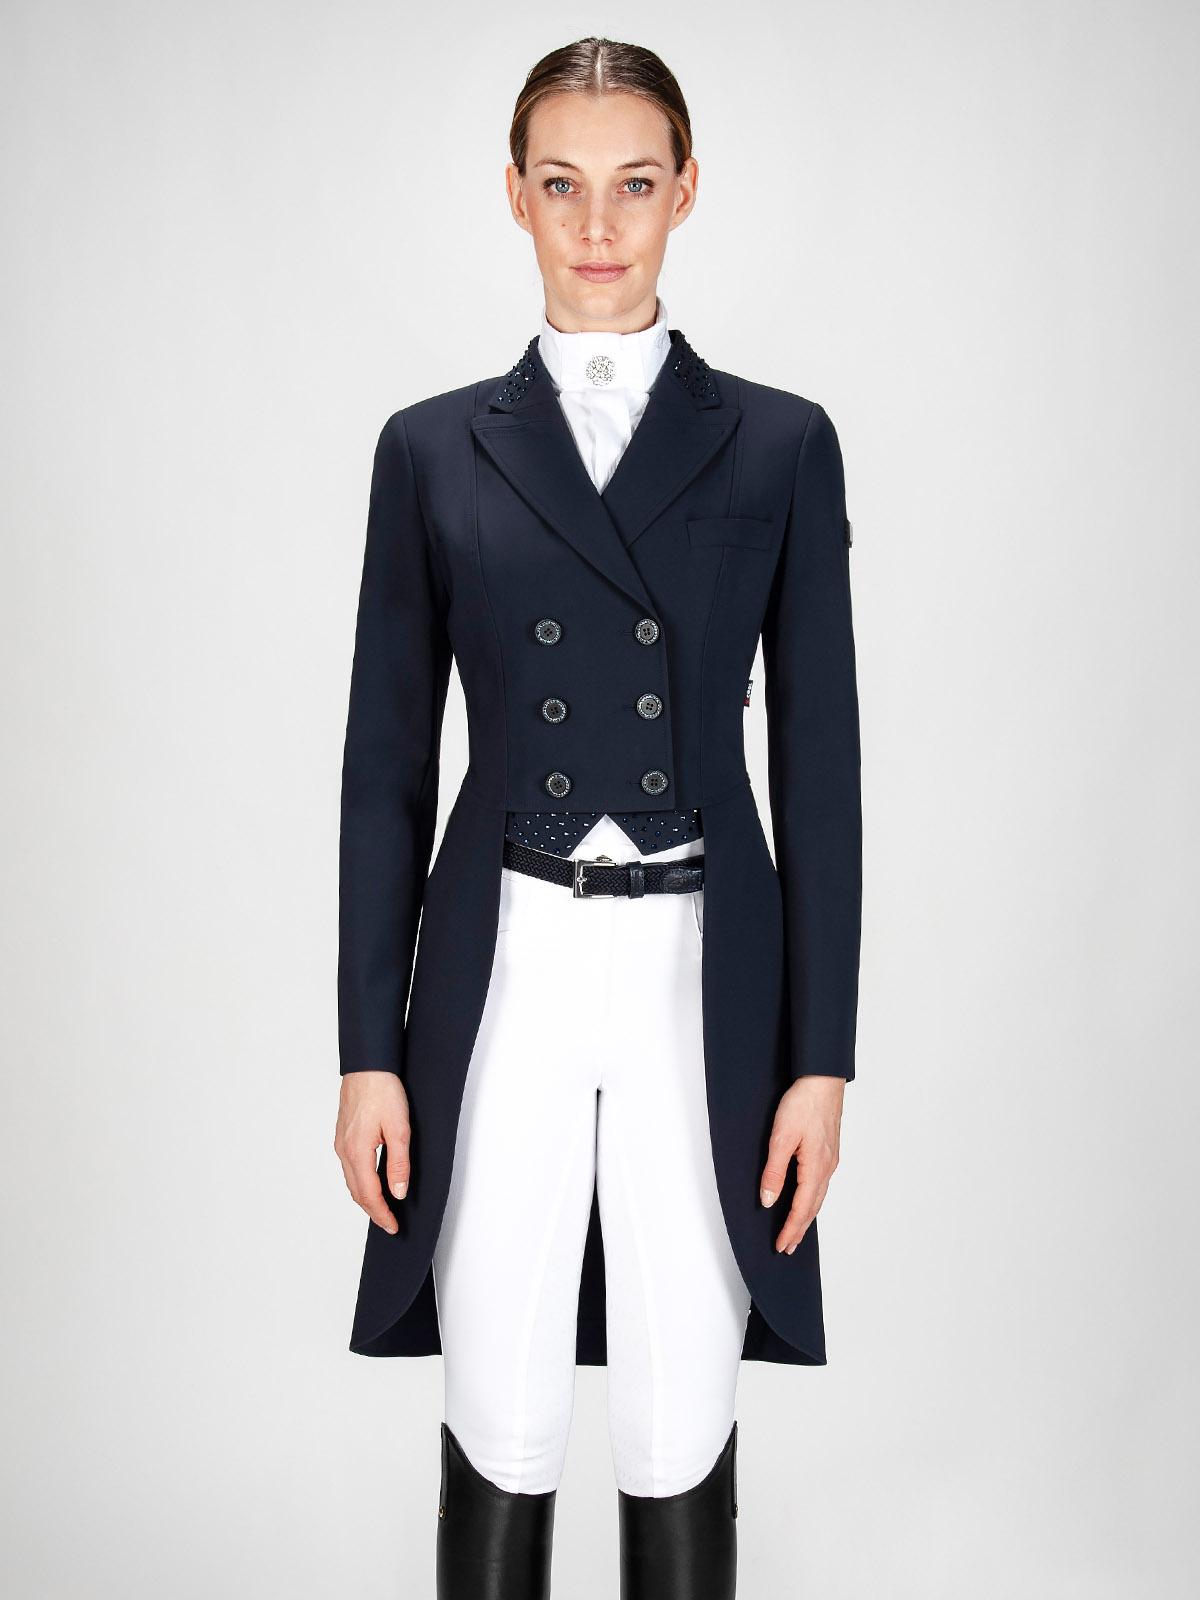 MARILYN - Women's Dressage Tail Coat X-Cool Evo 3